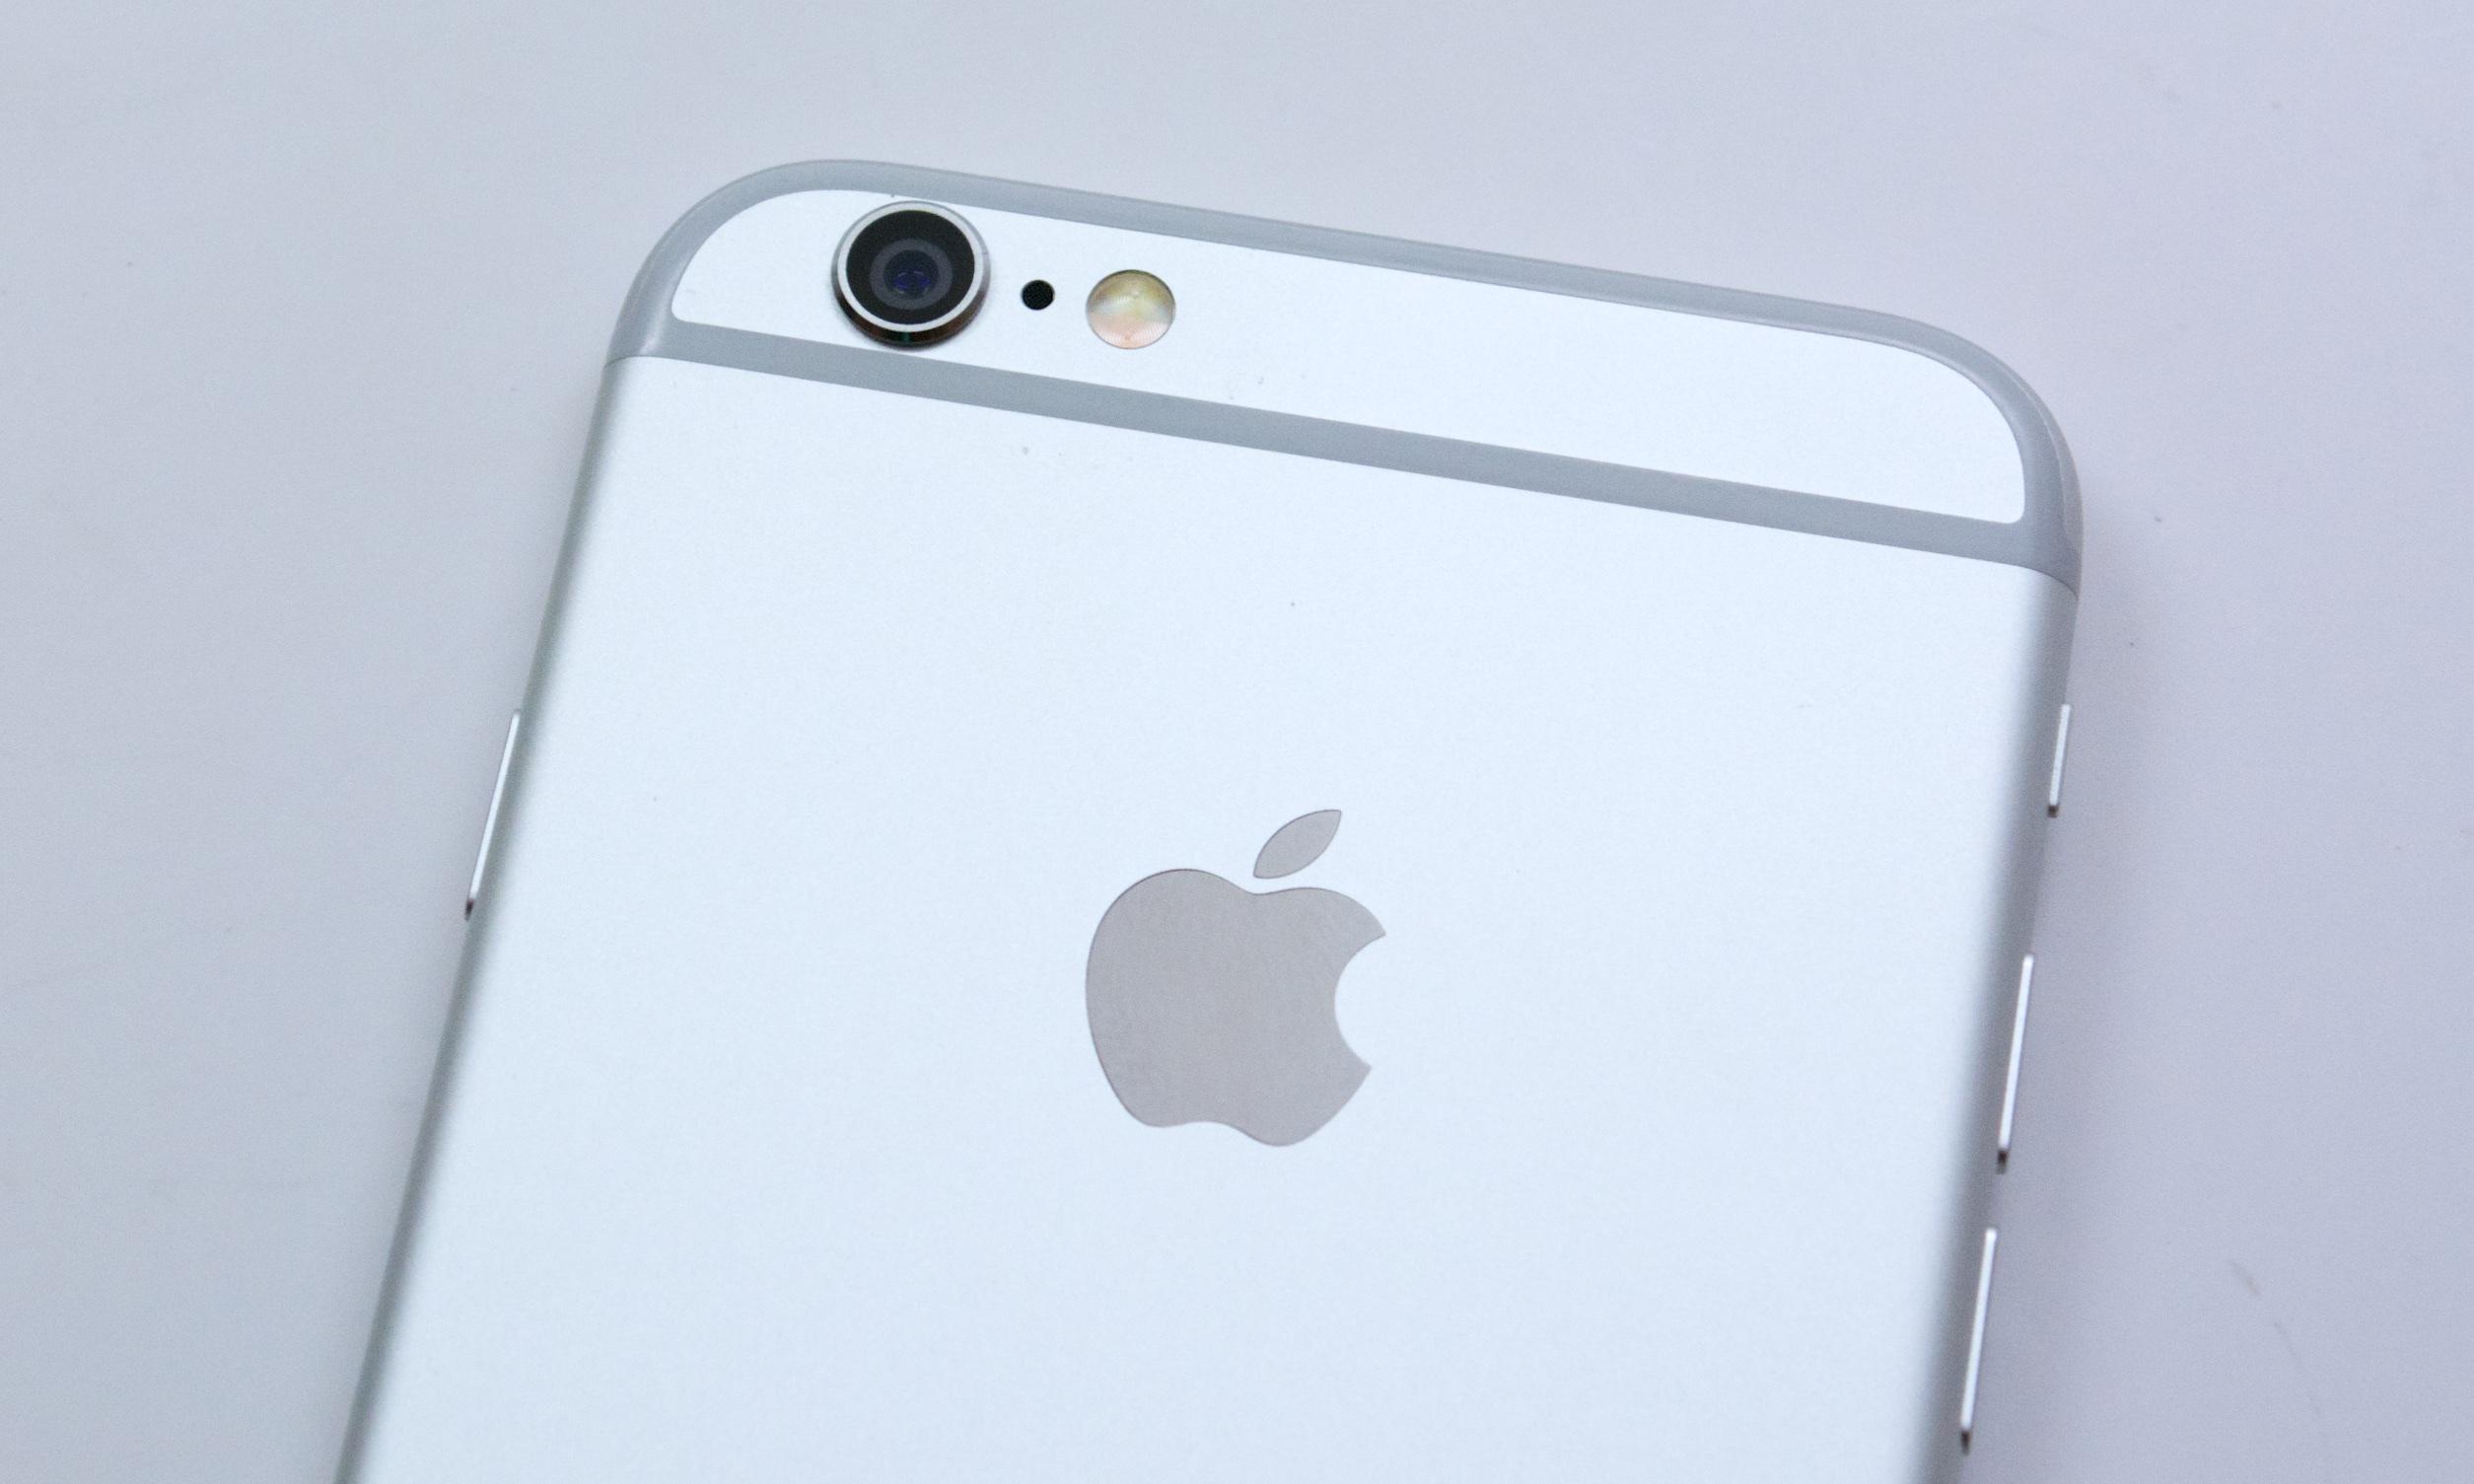 Granskning av iPhone 6 - 2